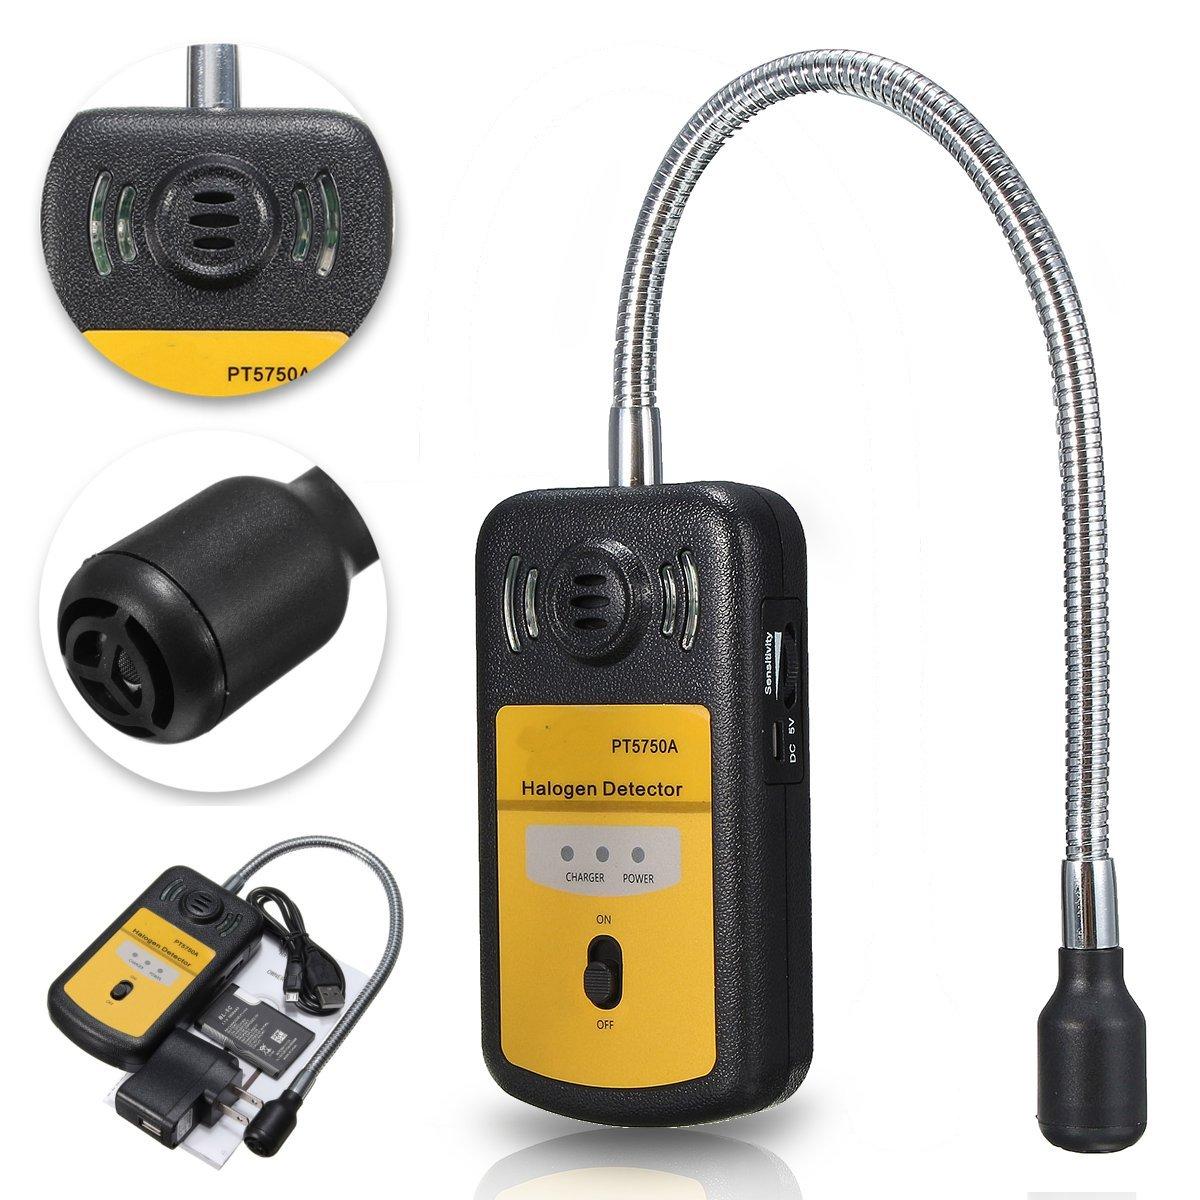 PT5750A Refrigerant Halogen Detector Leak R134a R410a R22 Air Condition HCFC CFC Checker